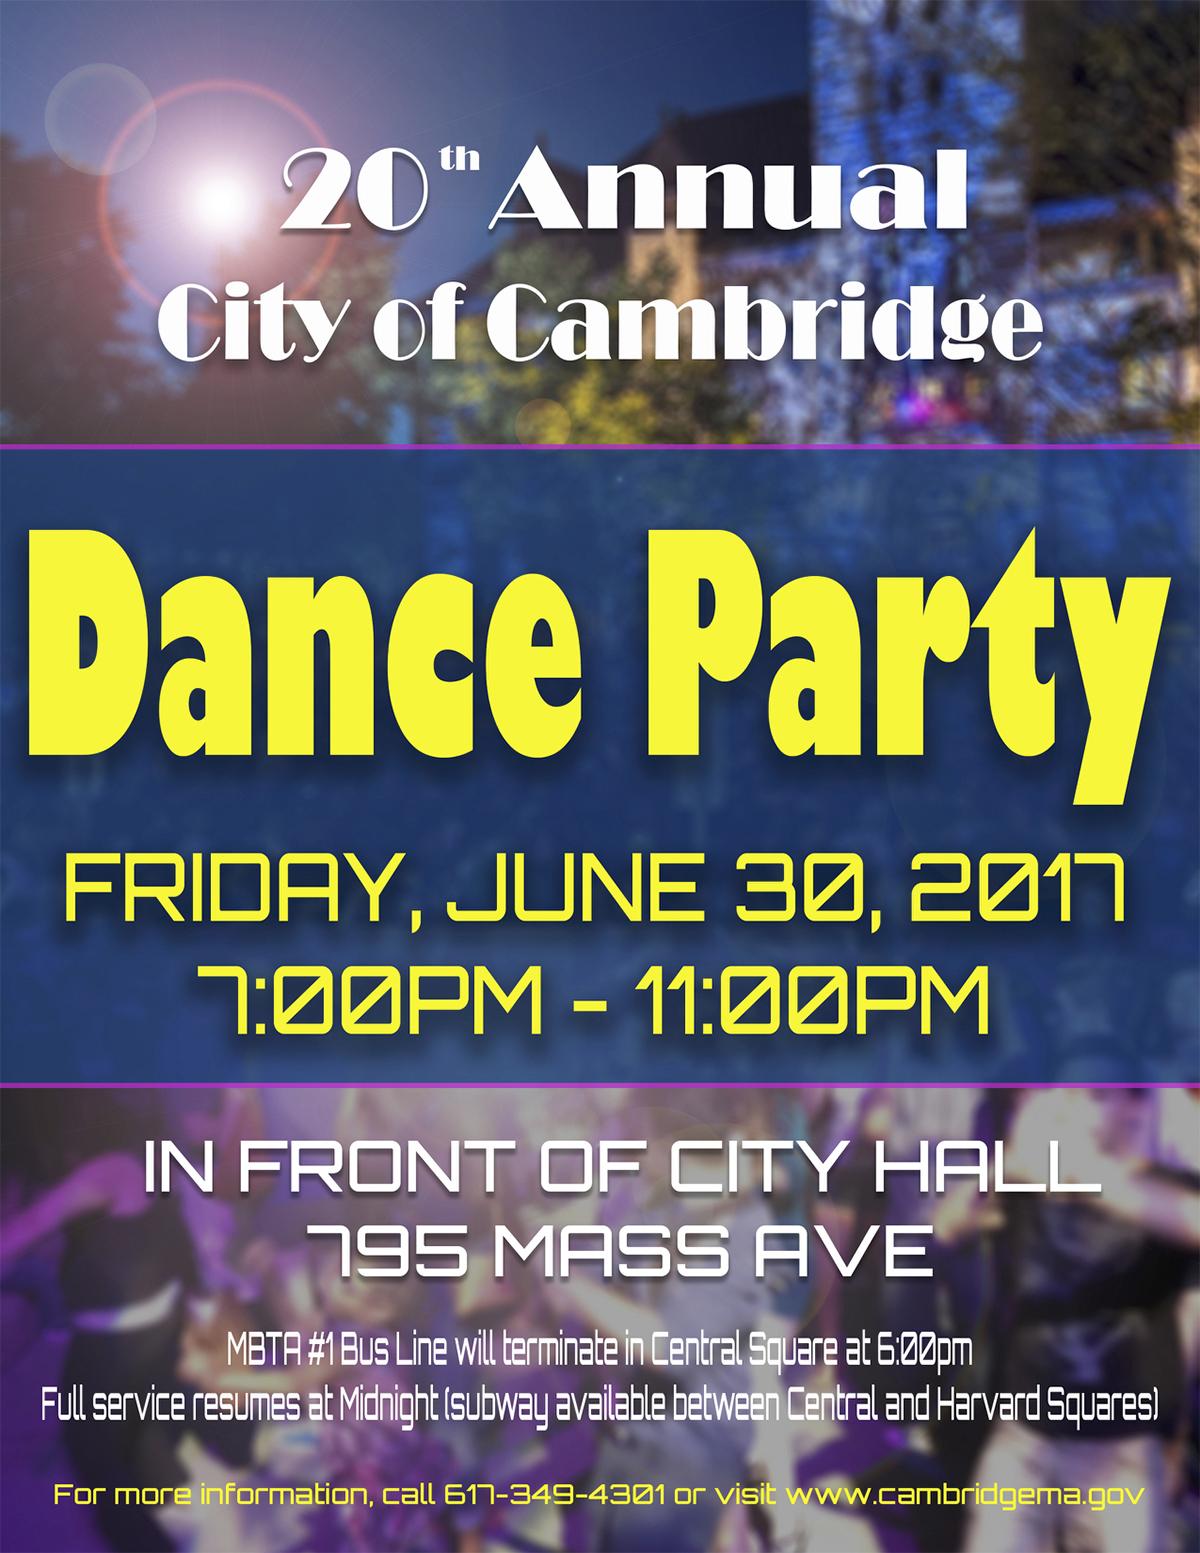 Cambridge dance party flyer